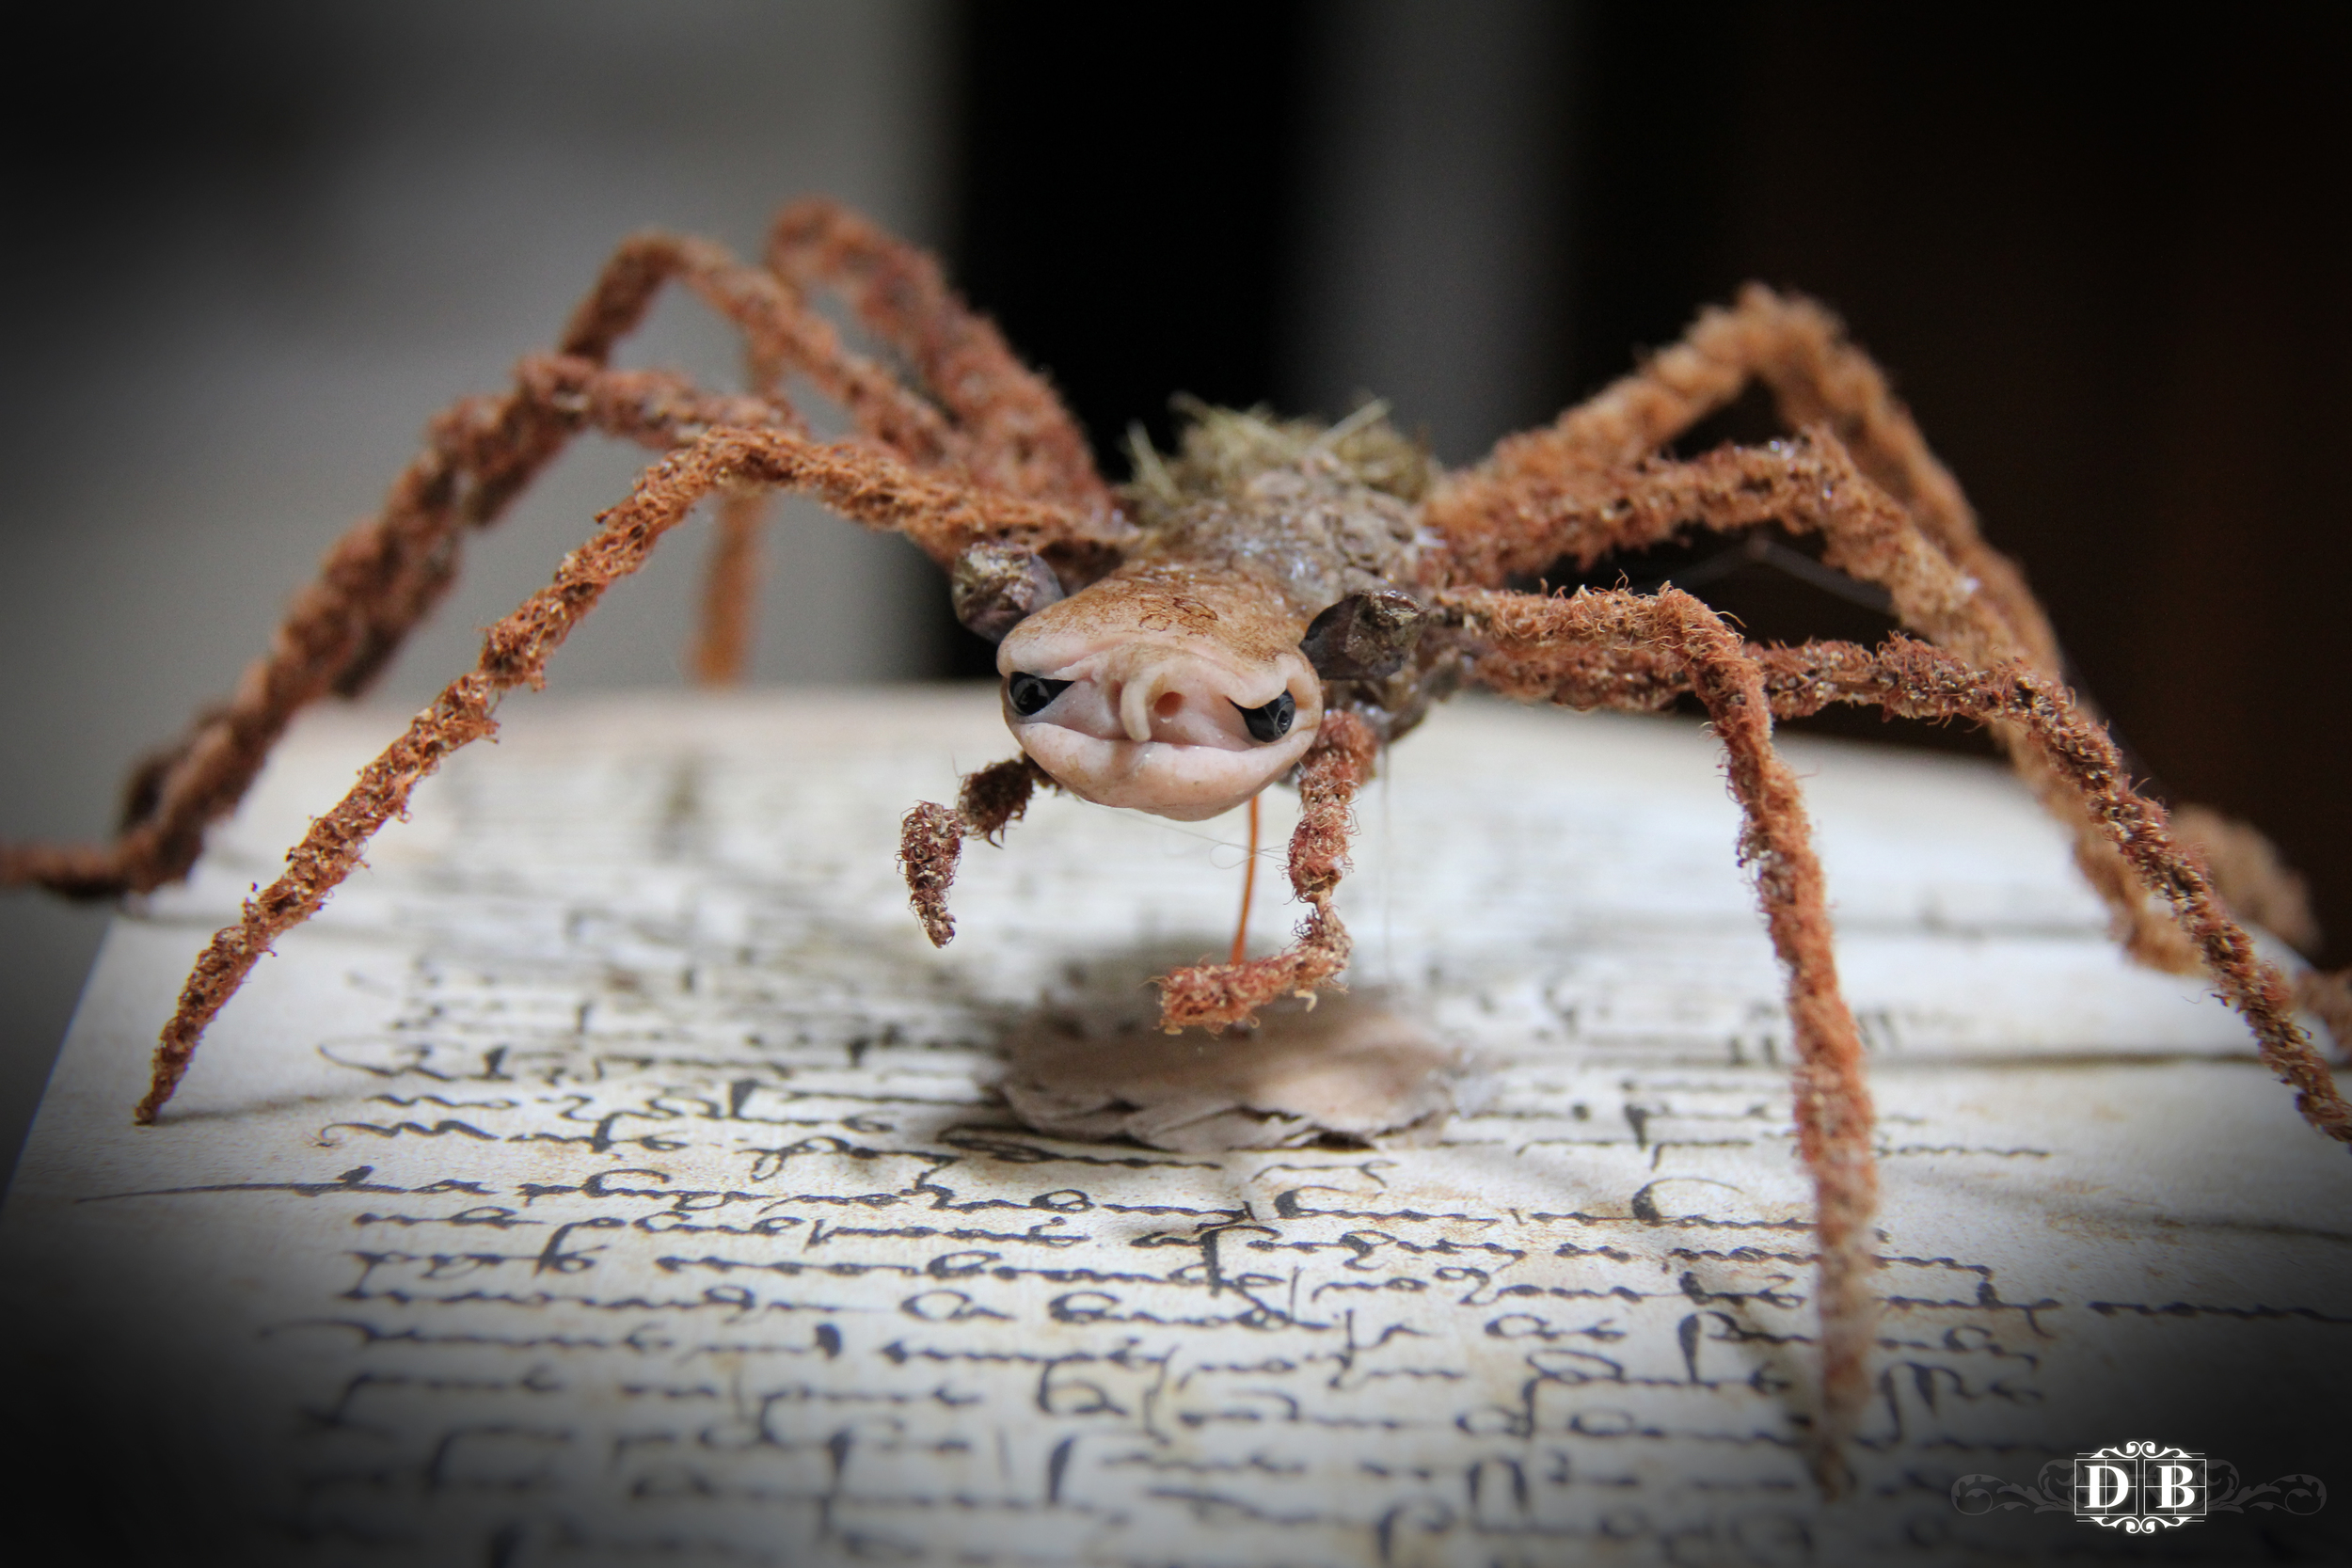 Spiderling_5.jpg